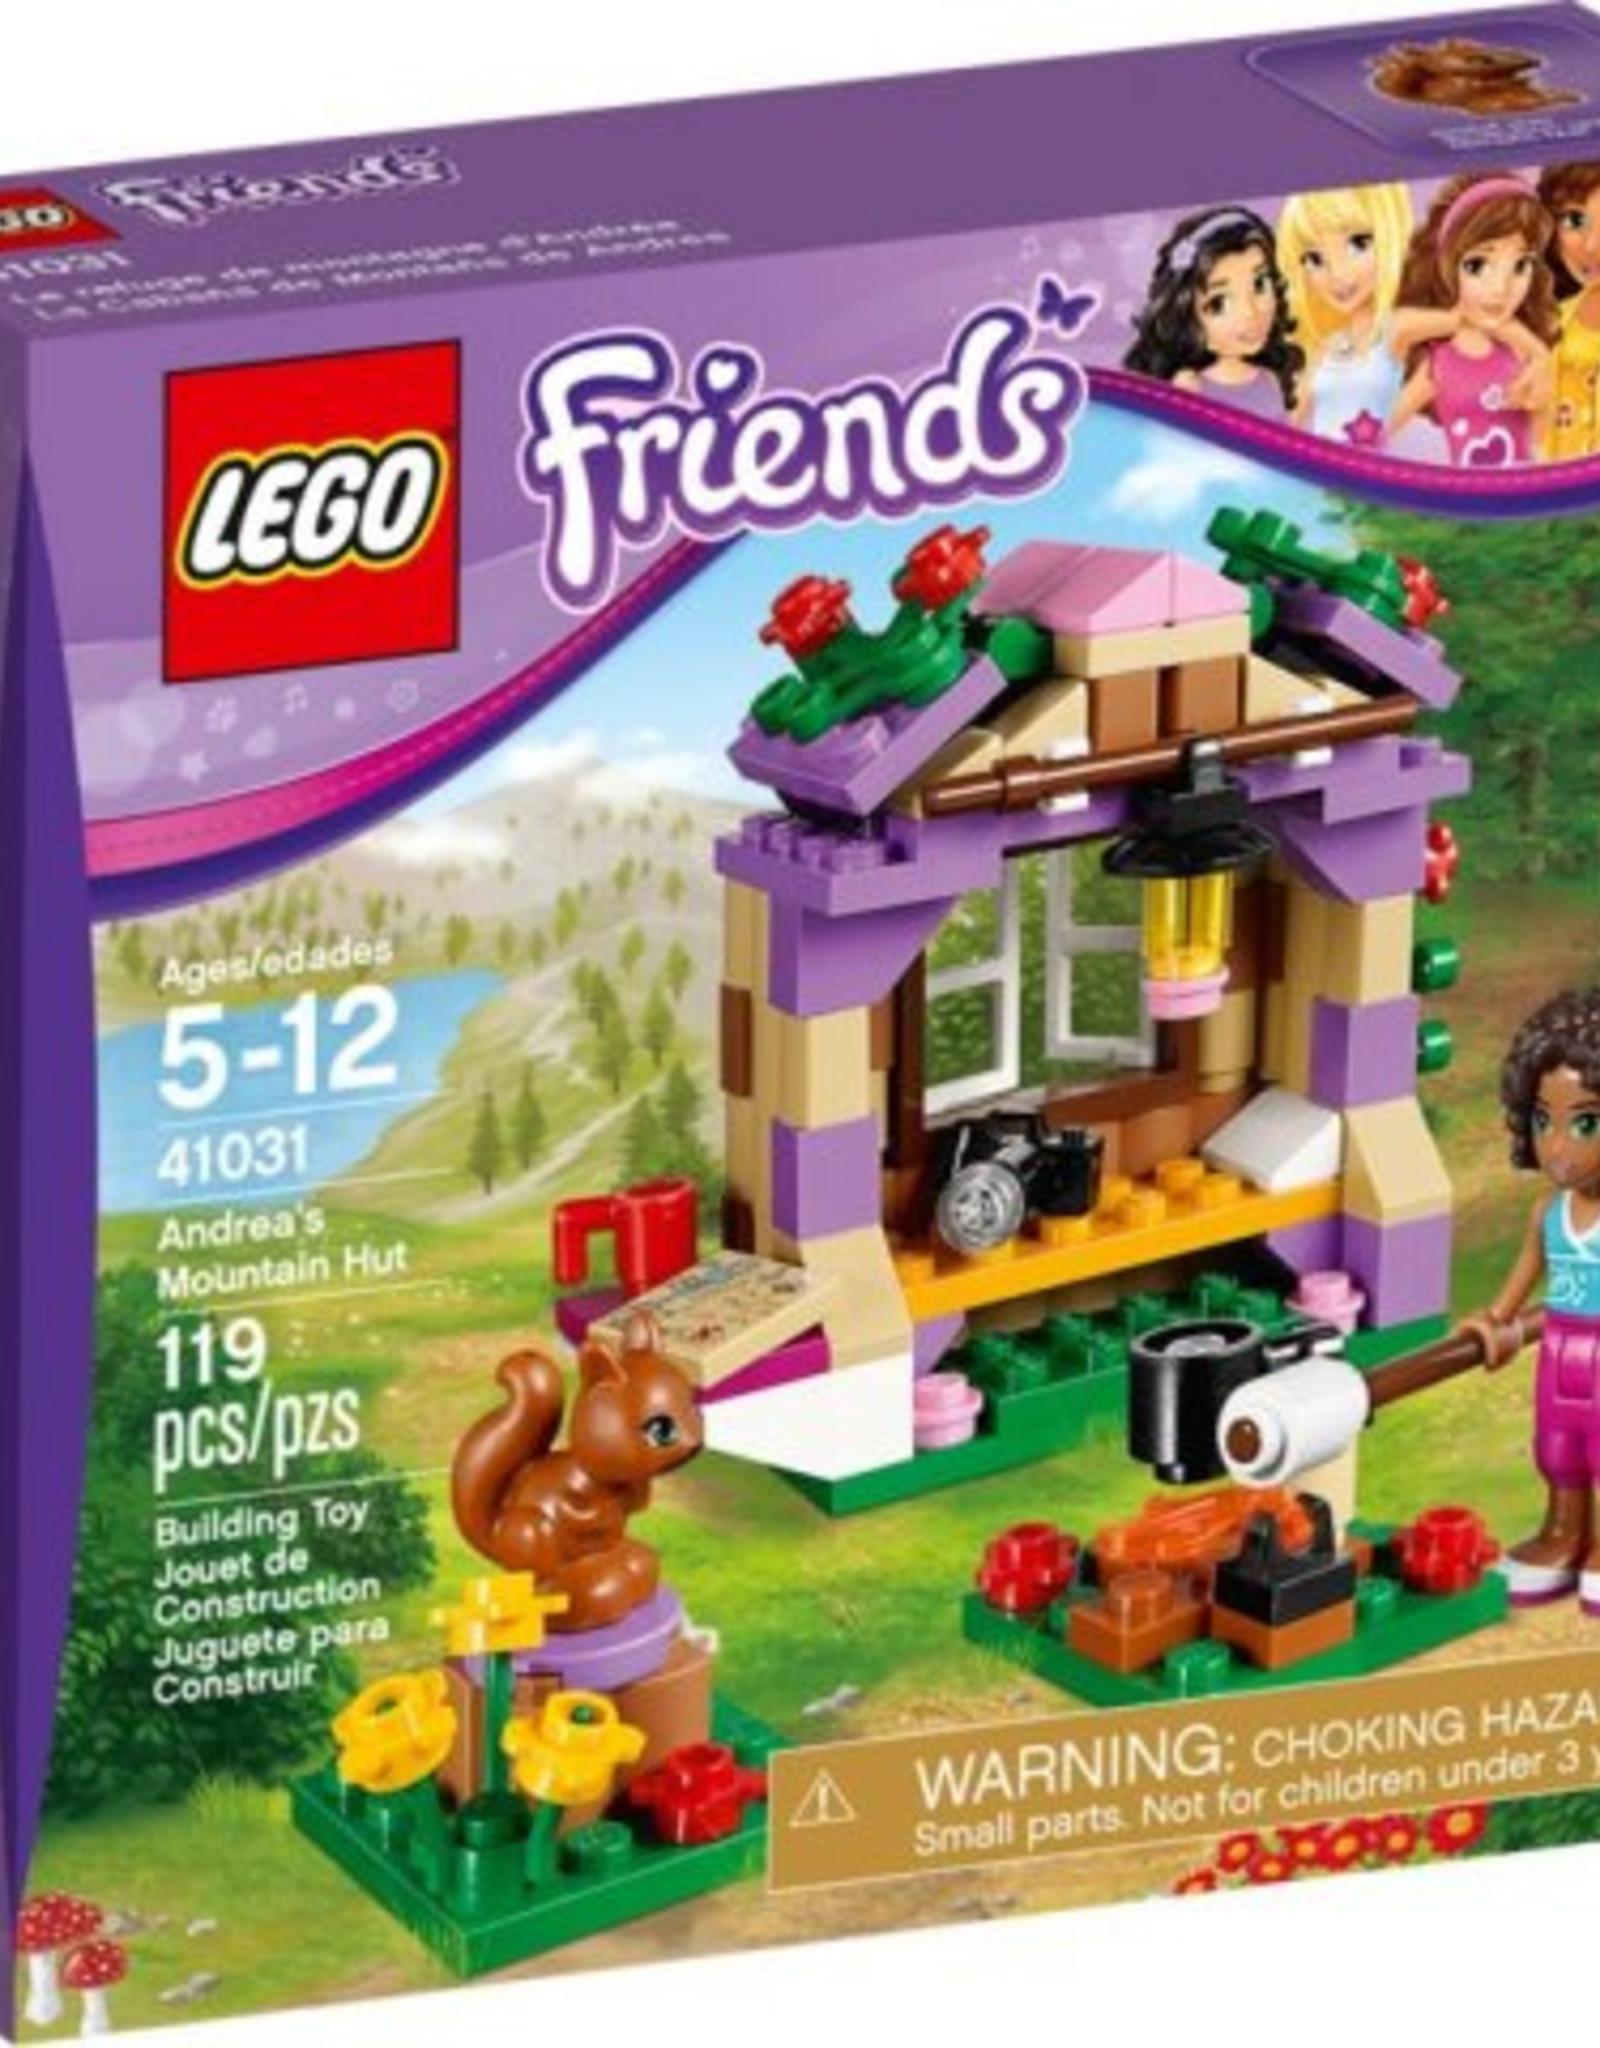 LEGO LEGO 41031 Andrea's Mountain Hut FRIENDS